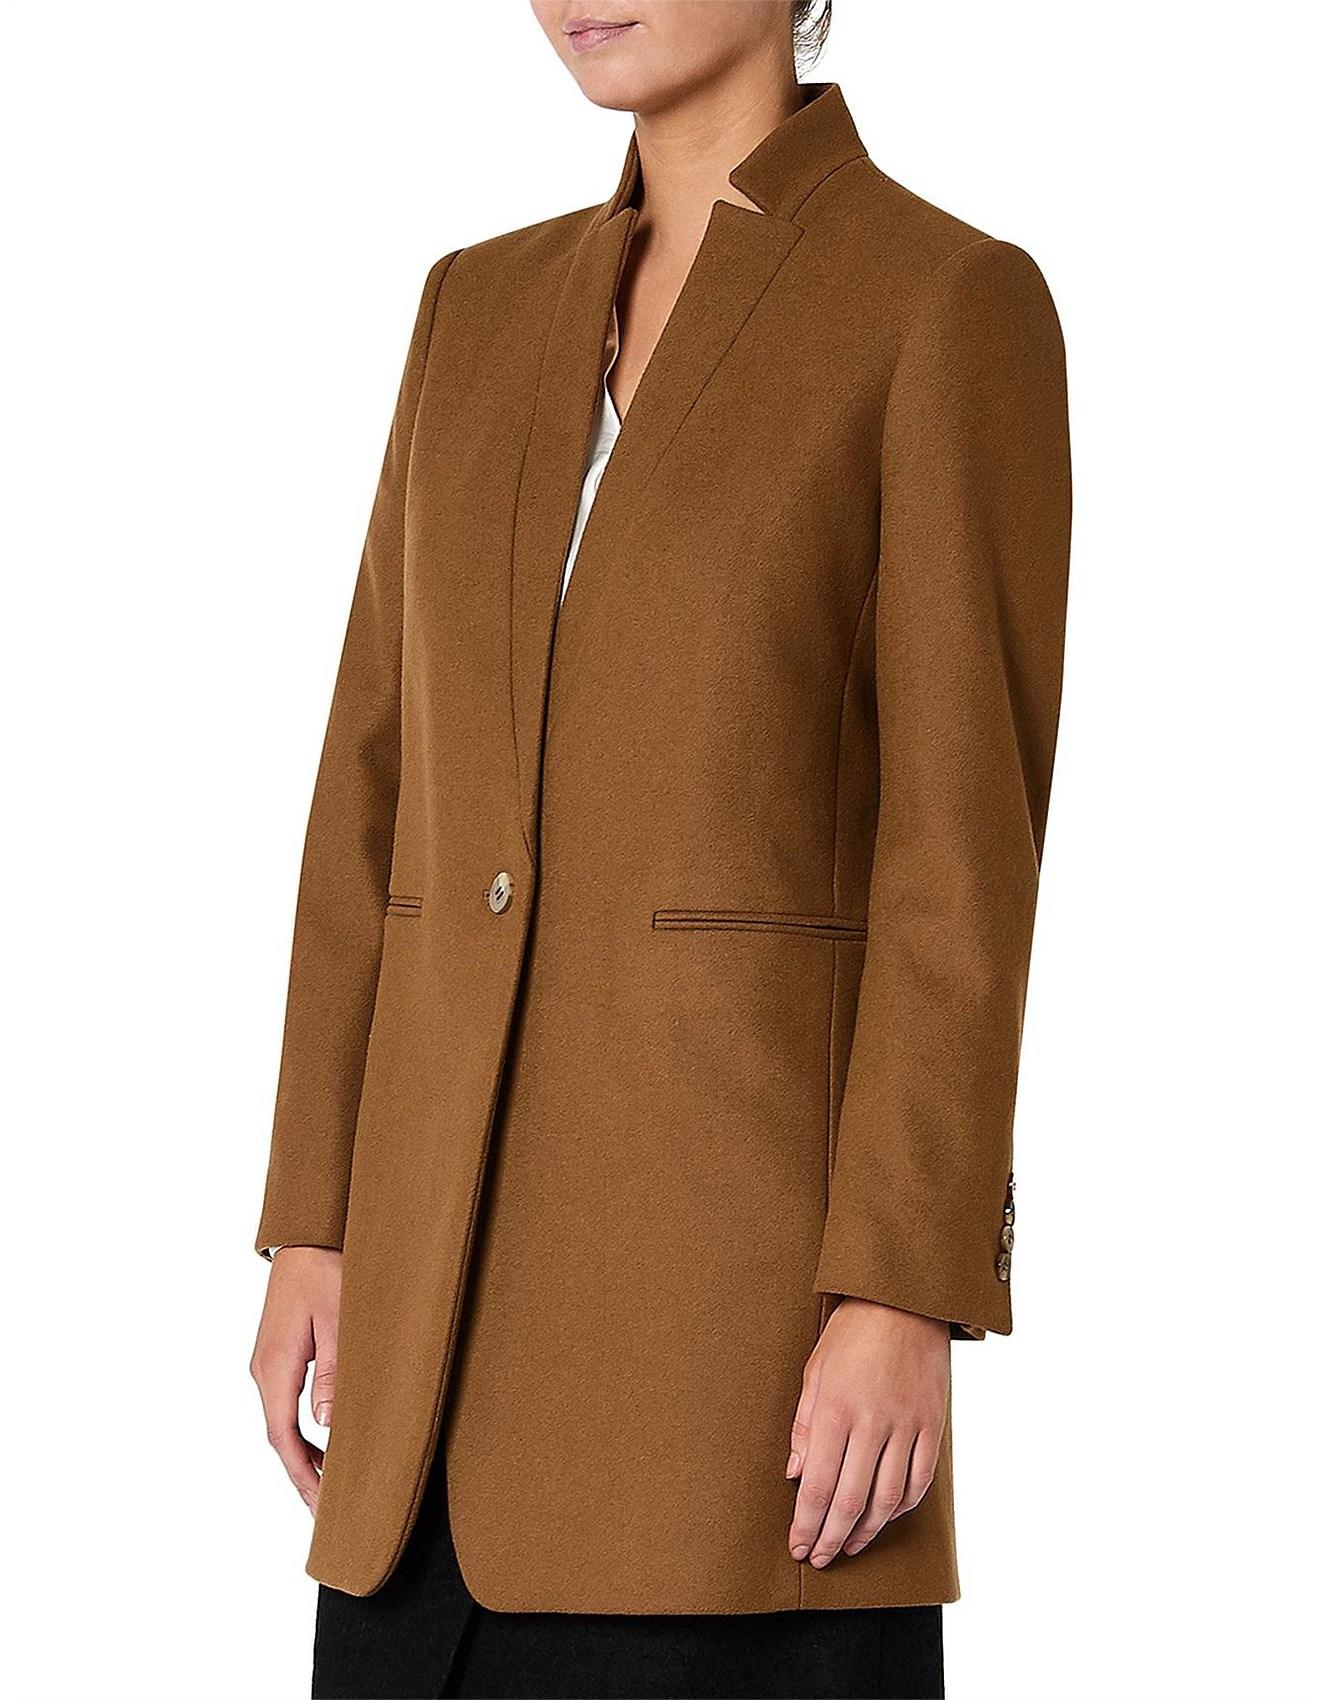 David jones womens jackets